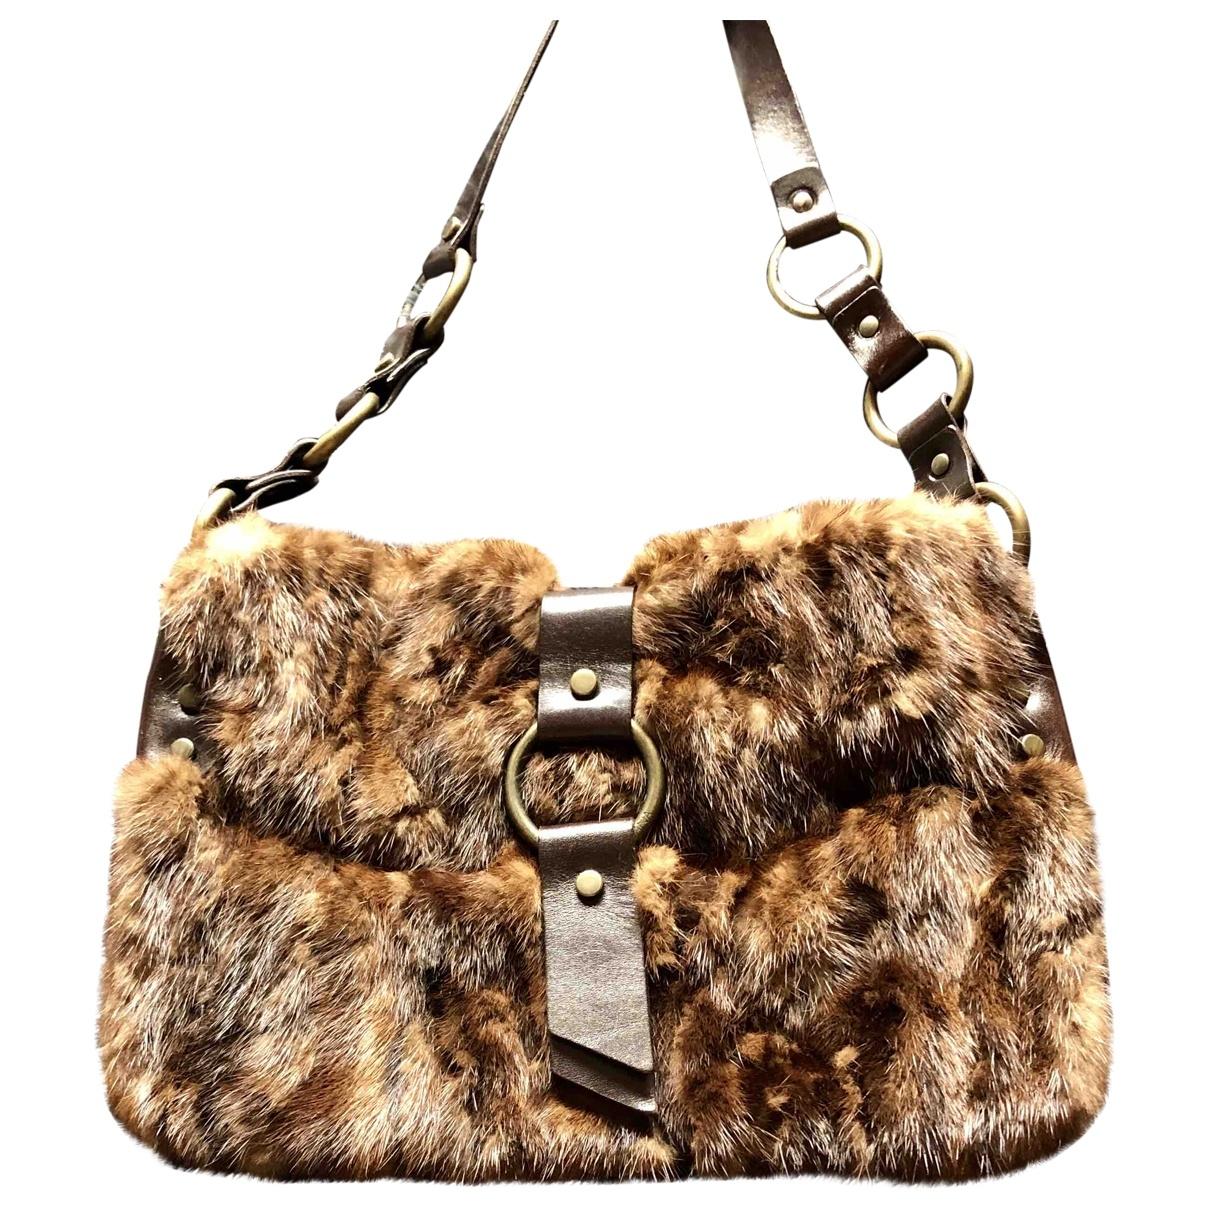 Dolce & Gabbana \N Brown Fur handbag for Women \N